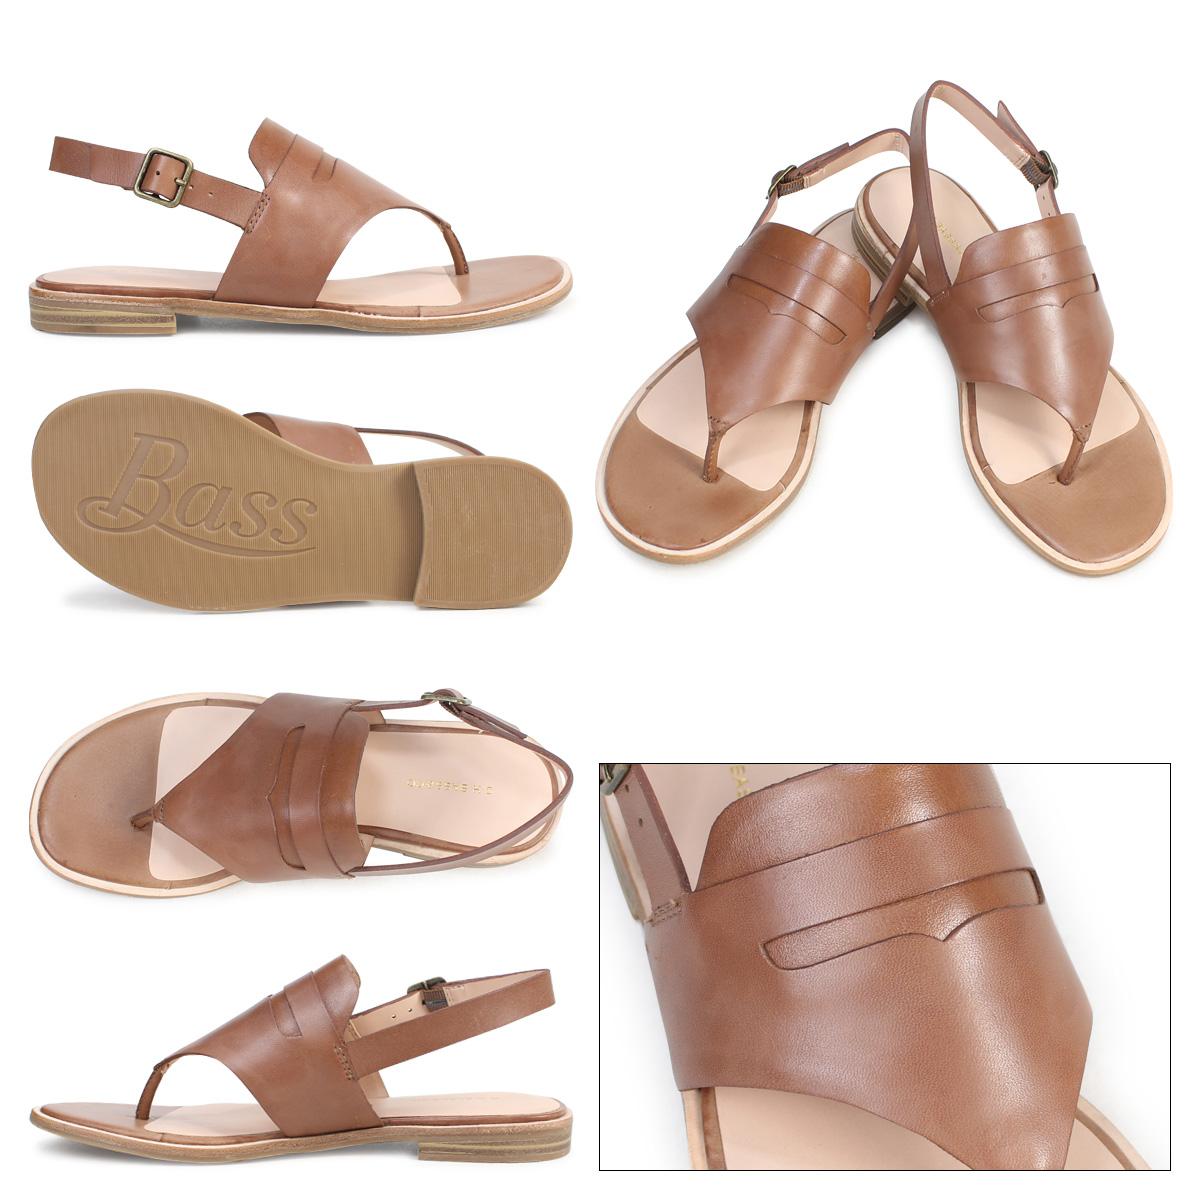 35fcde6d0e7 G H bus sandals Lady's G.H. BASS tong ankle strap MADDIE THONG SANDAL  71-20,338 shoes brown [177]